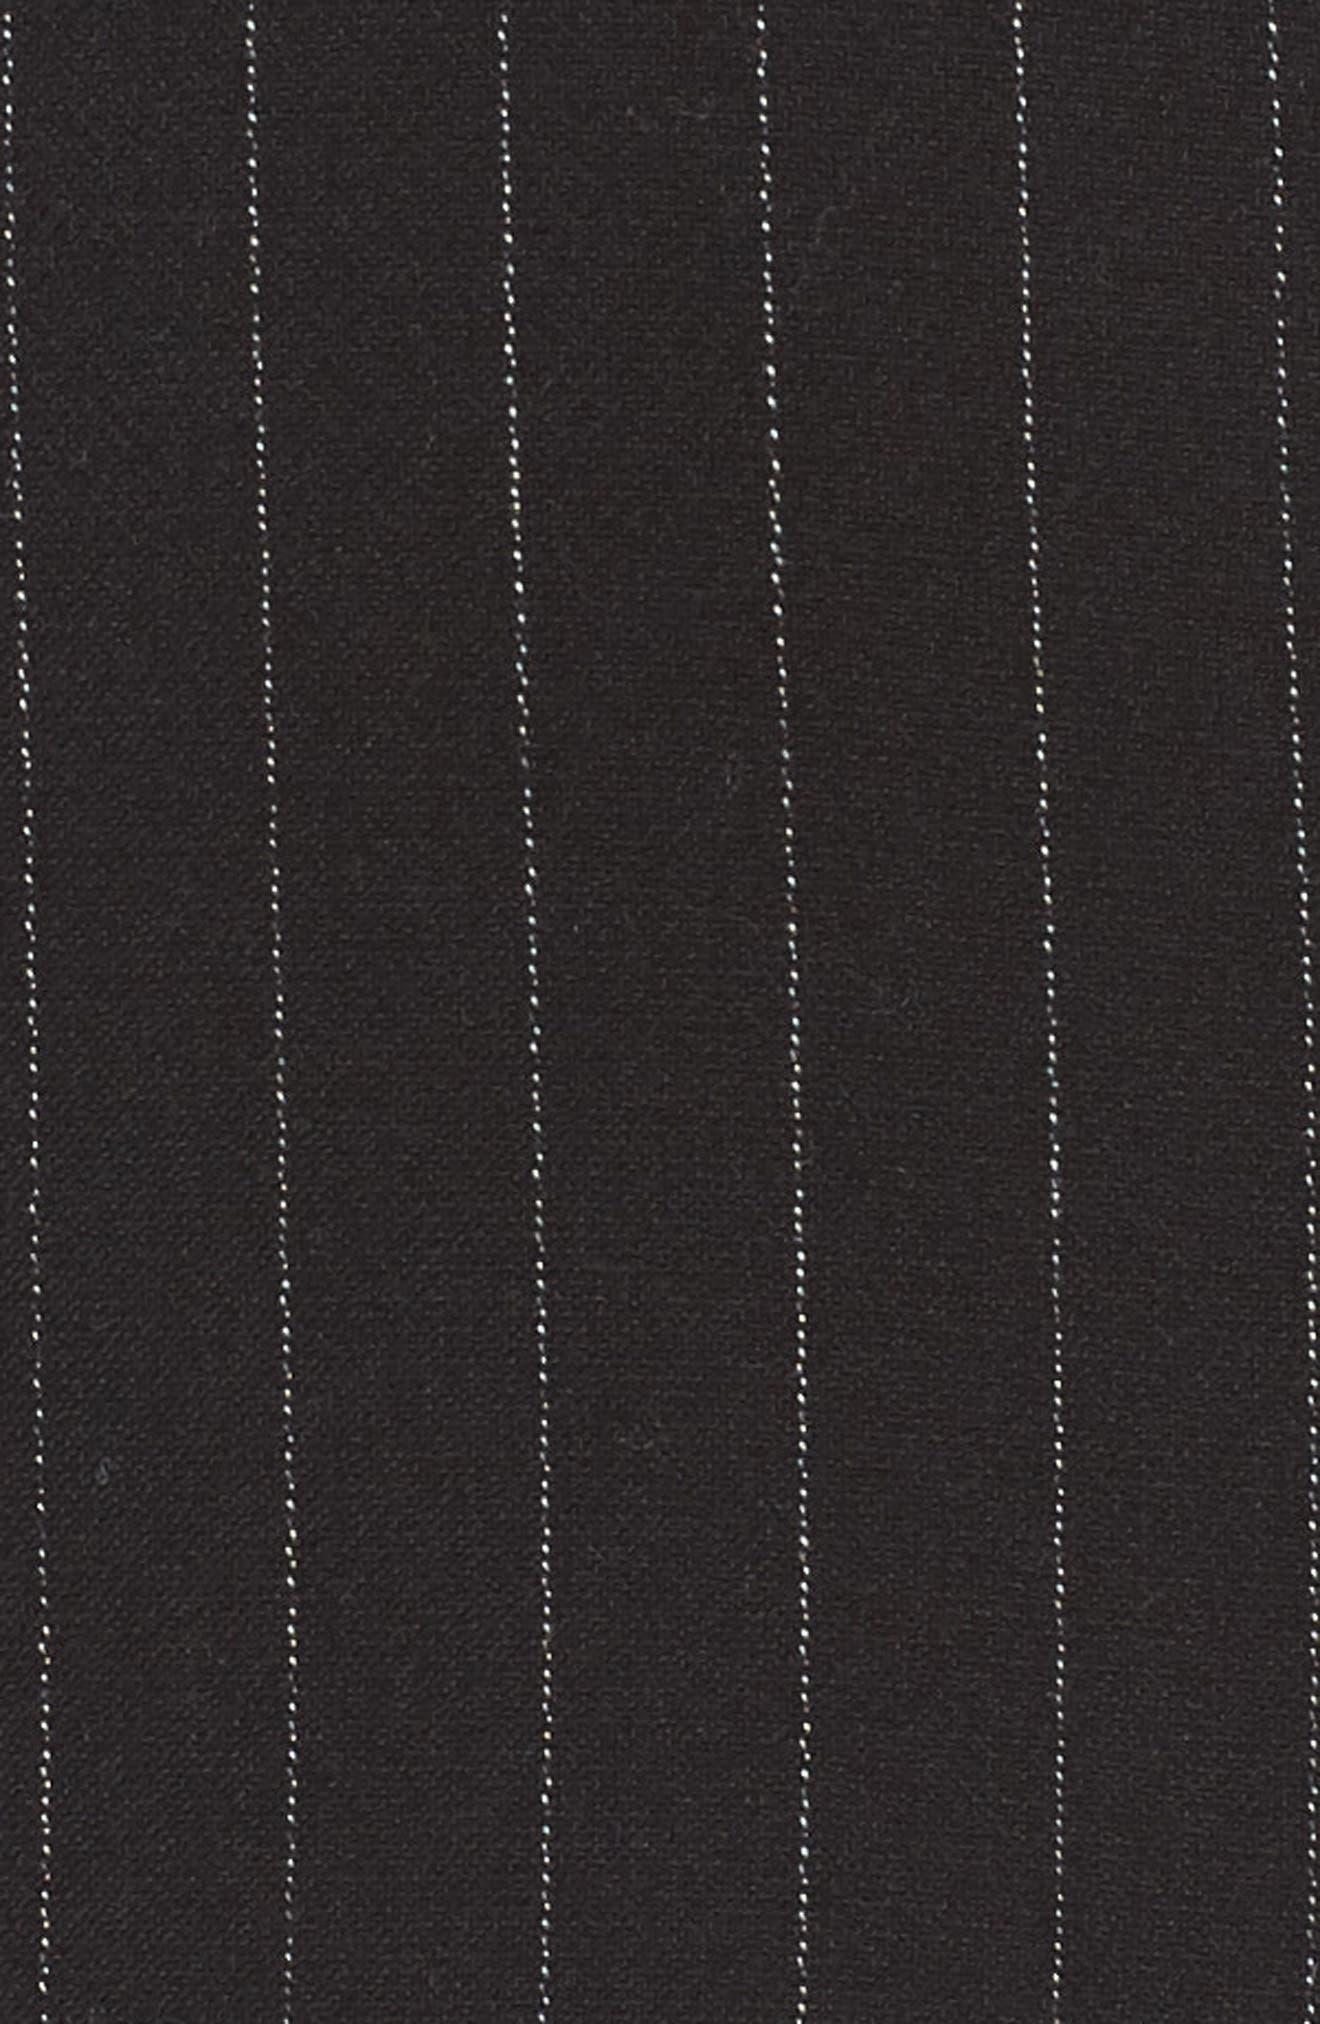 Dominic Asymmetrical Ruffle Skirt,                             Alternate thumbnail 5, color,                             001